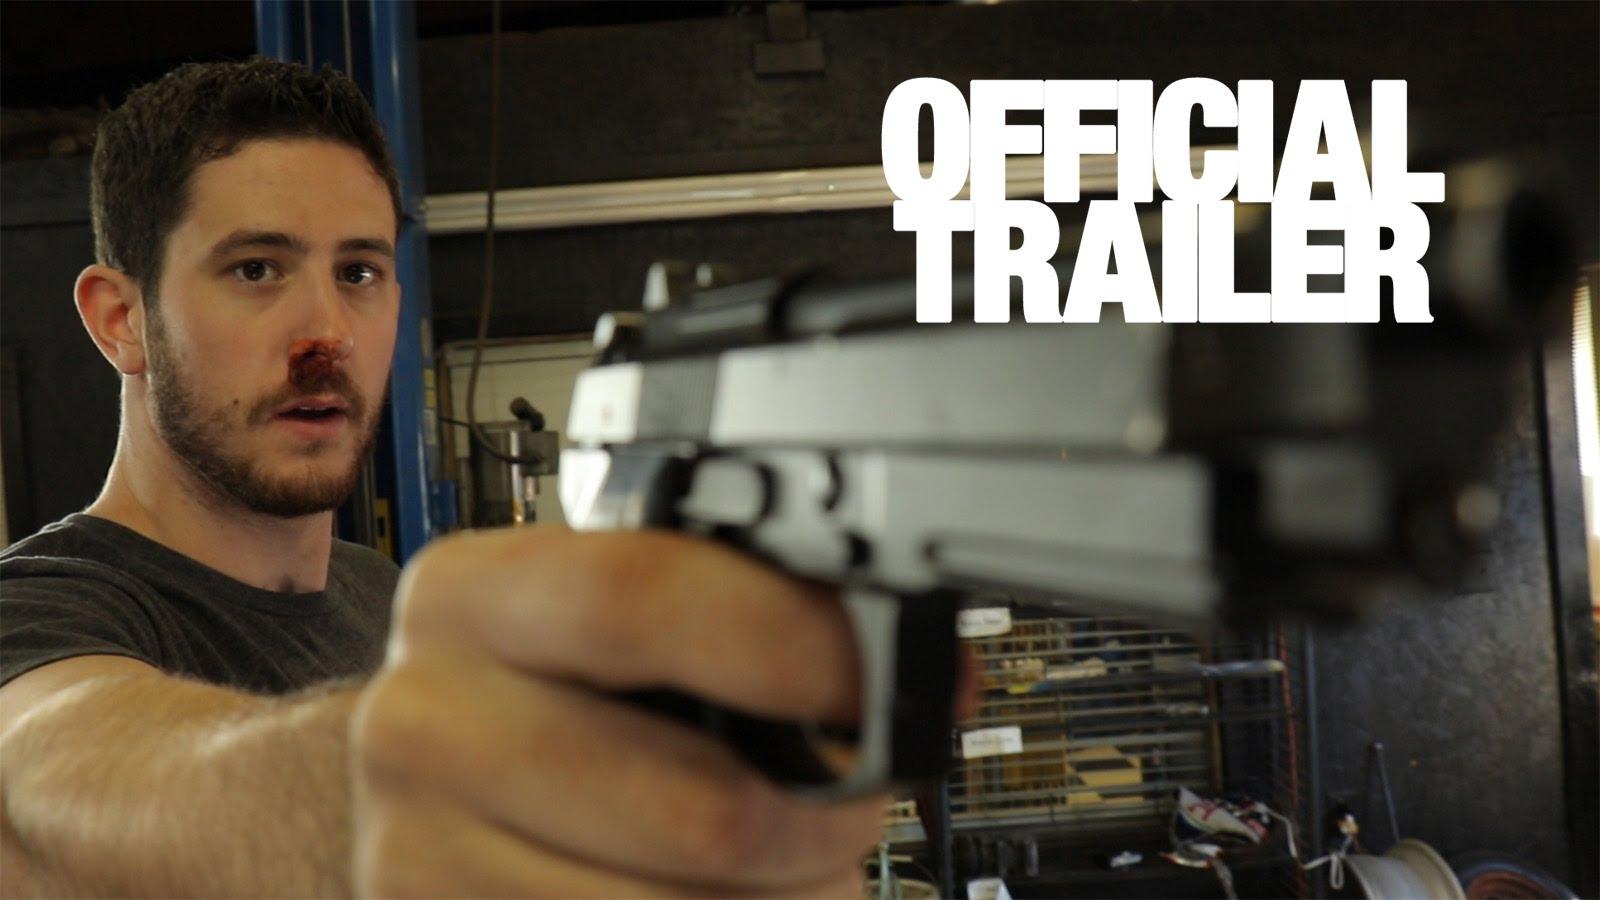 SHIFTING GEARS Trailer 1 - HD Movie Clip